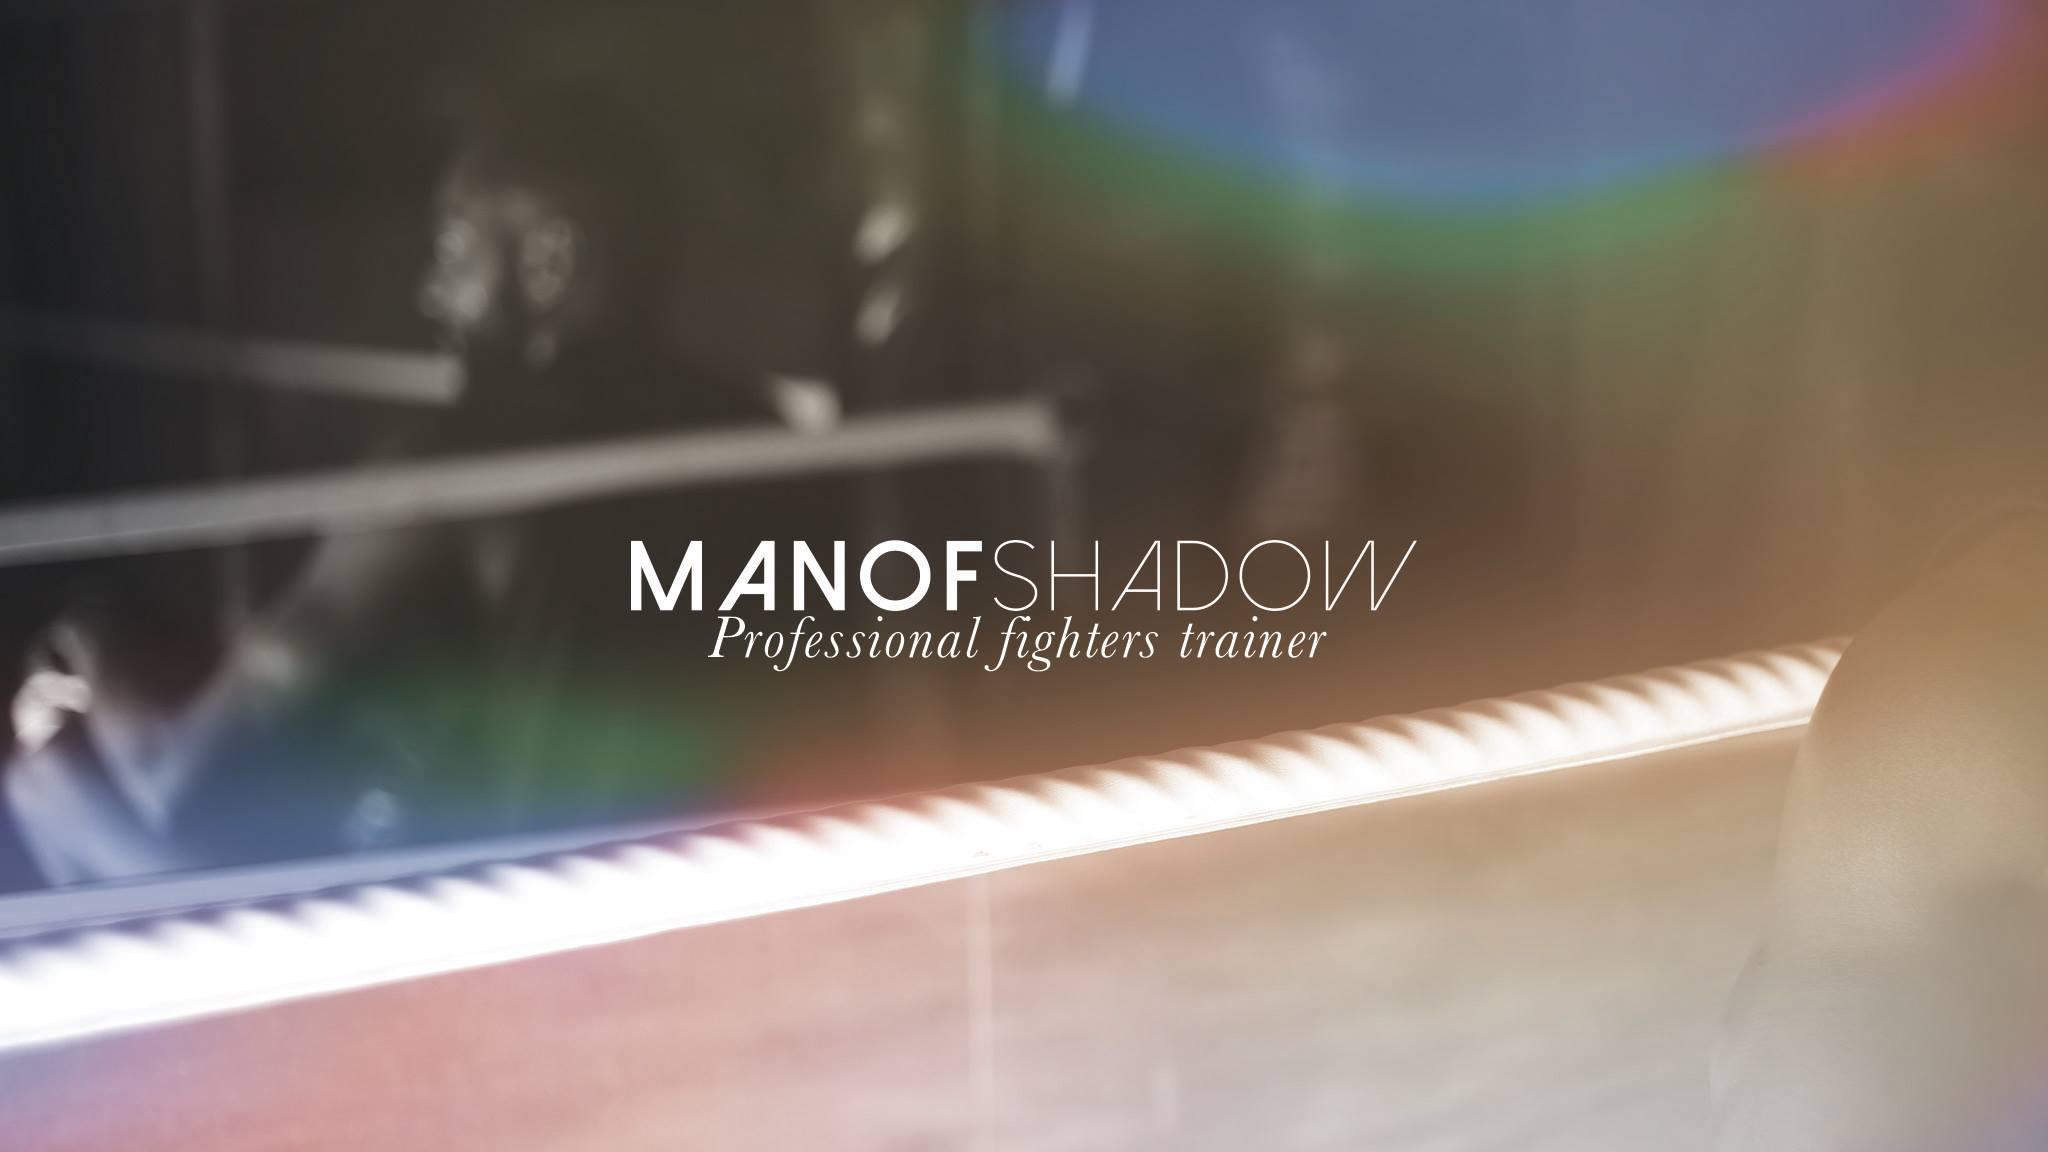 Manofshadow